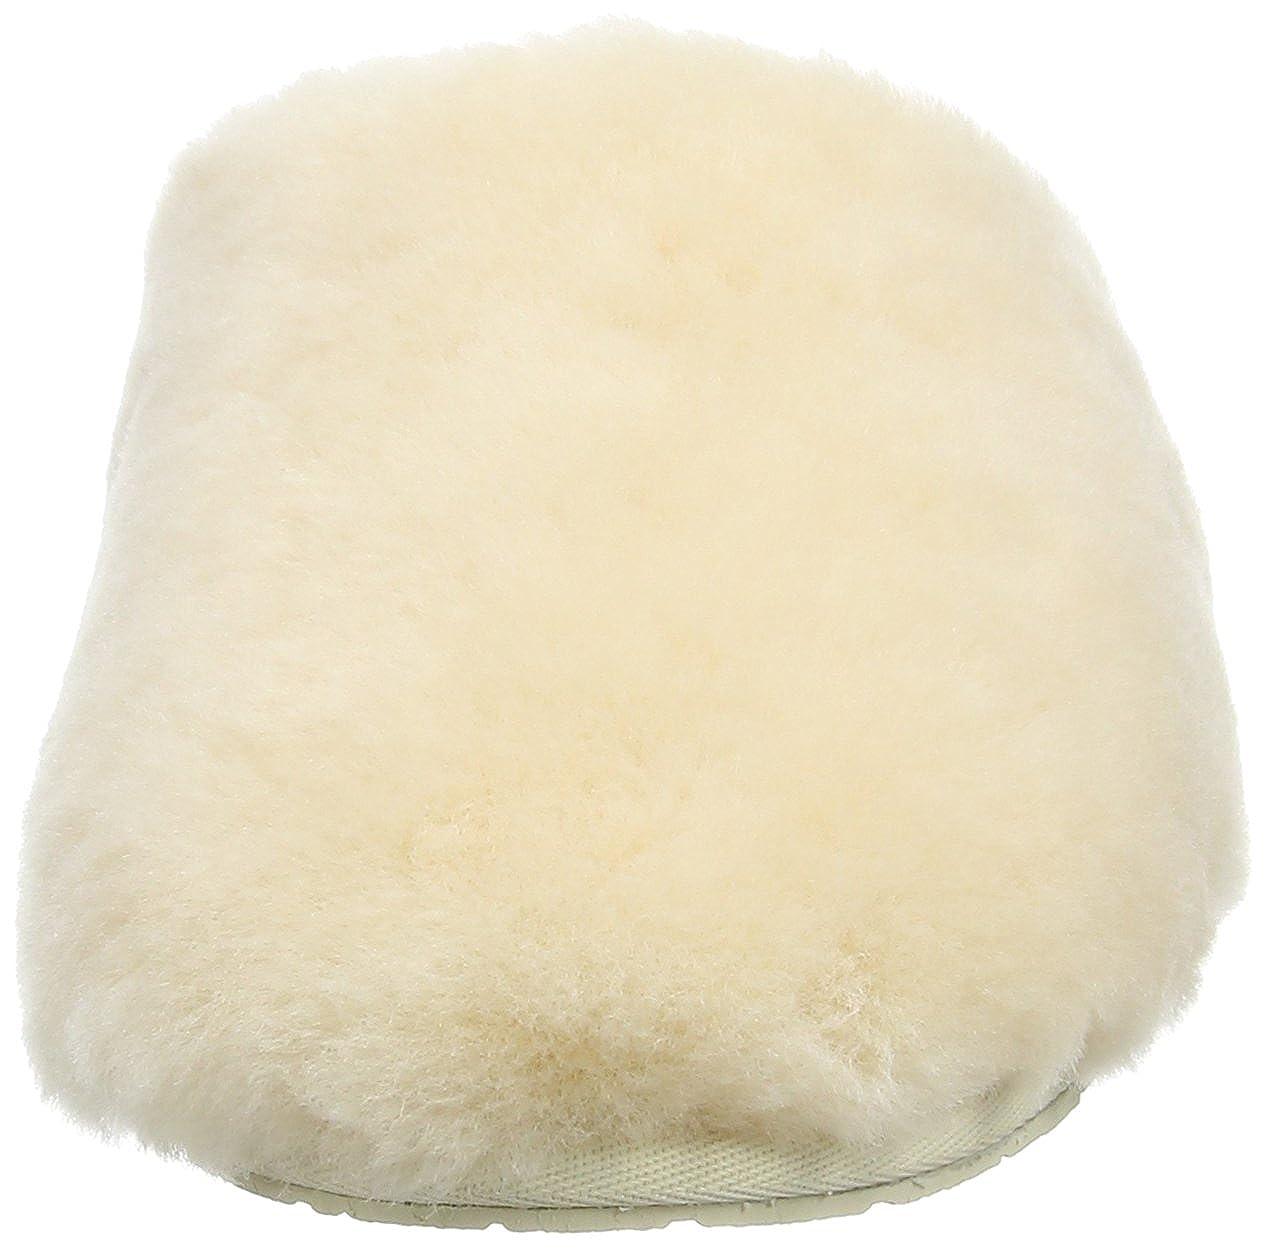 a4313ec75ea Ugg Australia Fluff Clog, Women's House Slippers, Beige (Natural), 3.5 UK  (36 EU)